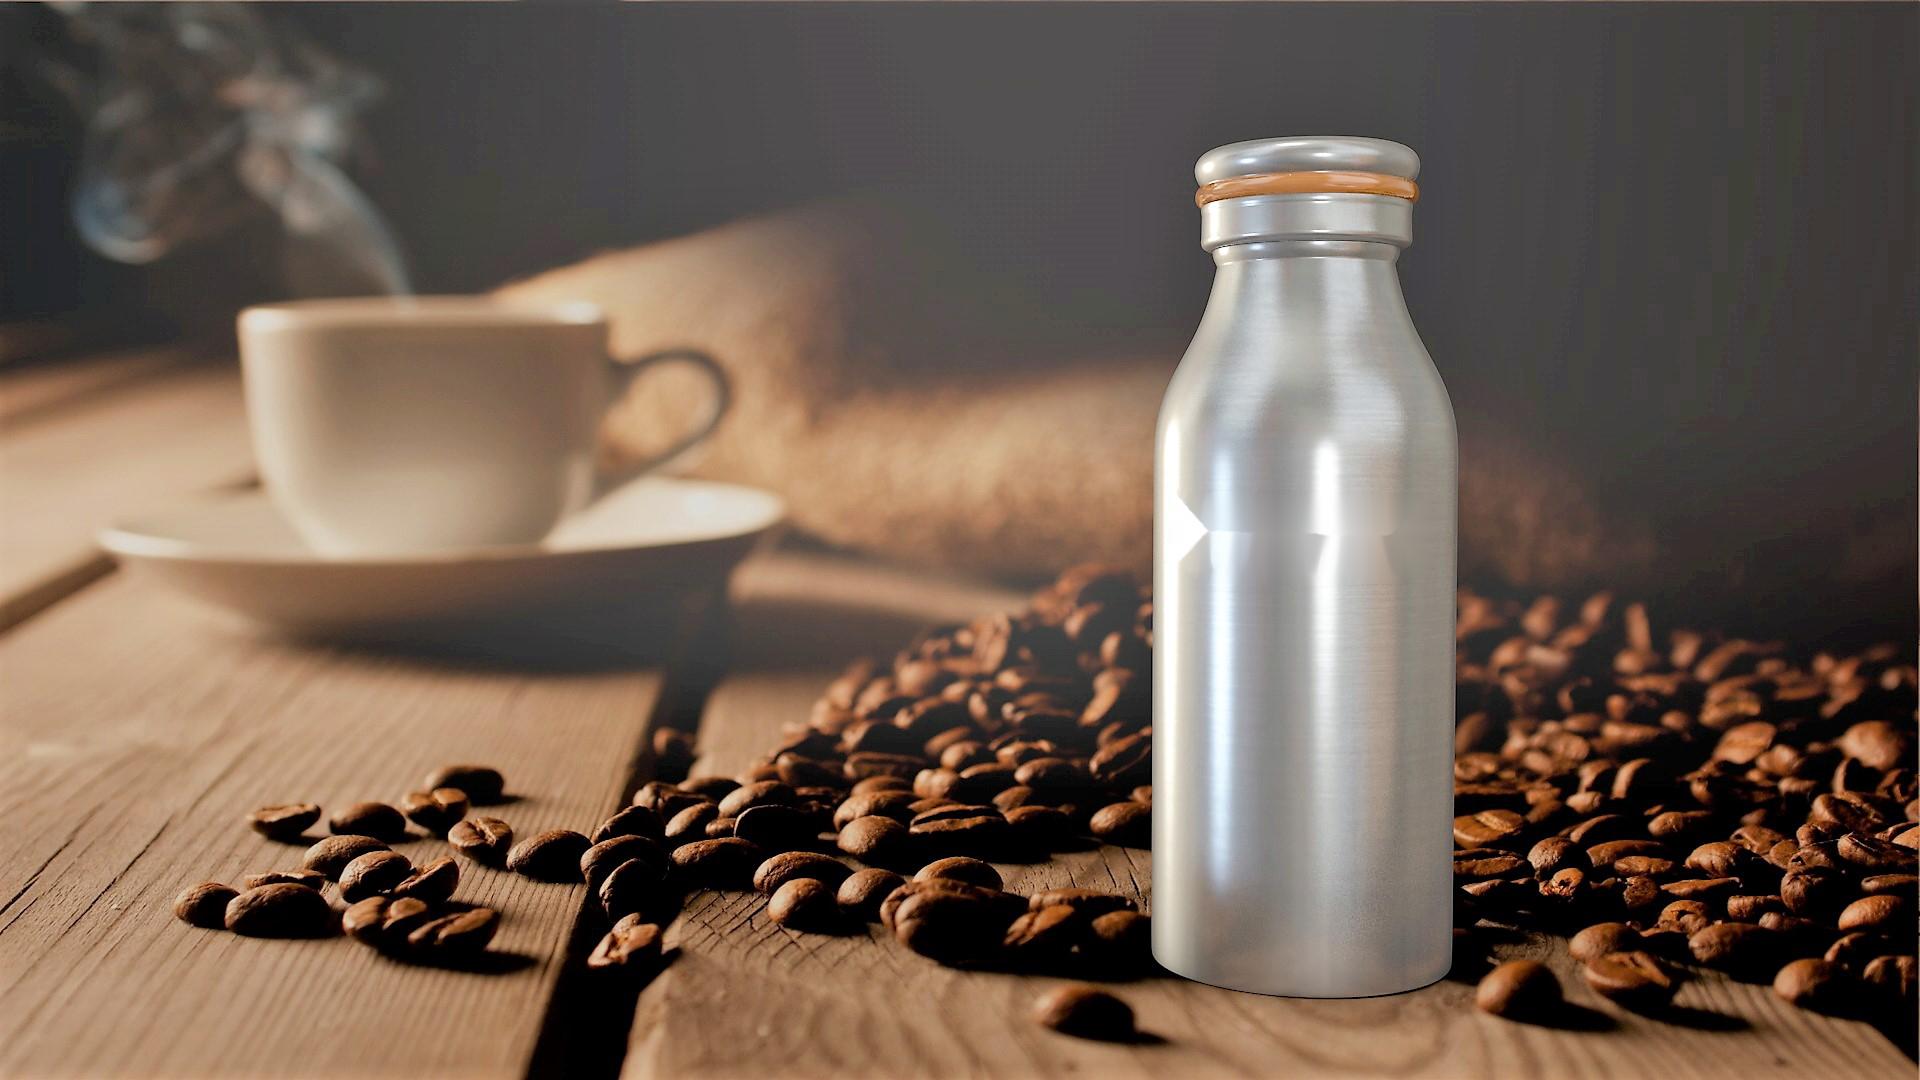 Werbeartikel: Bottle and coffee Edelstahl-flasche